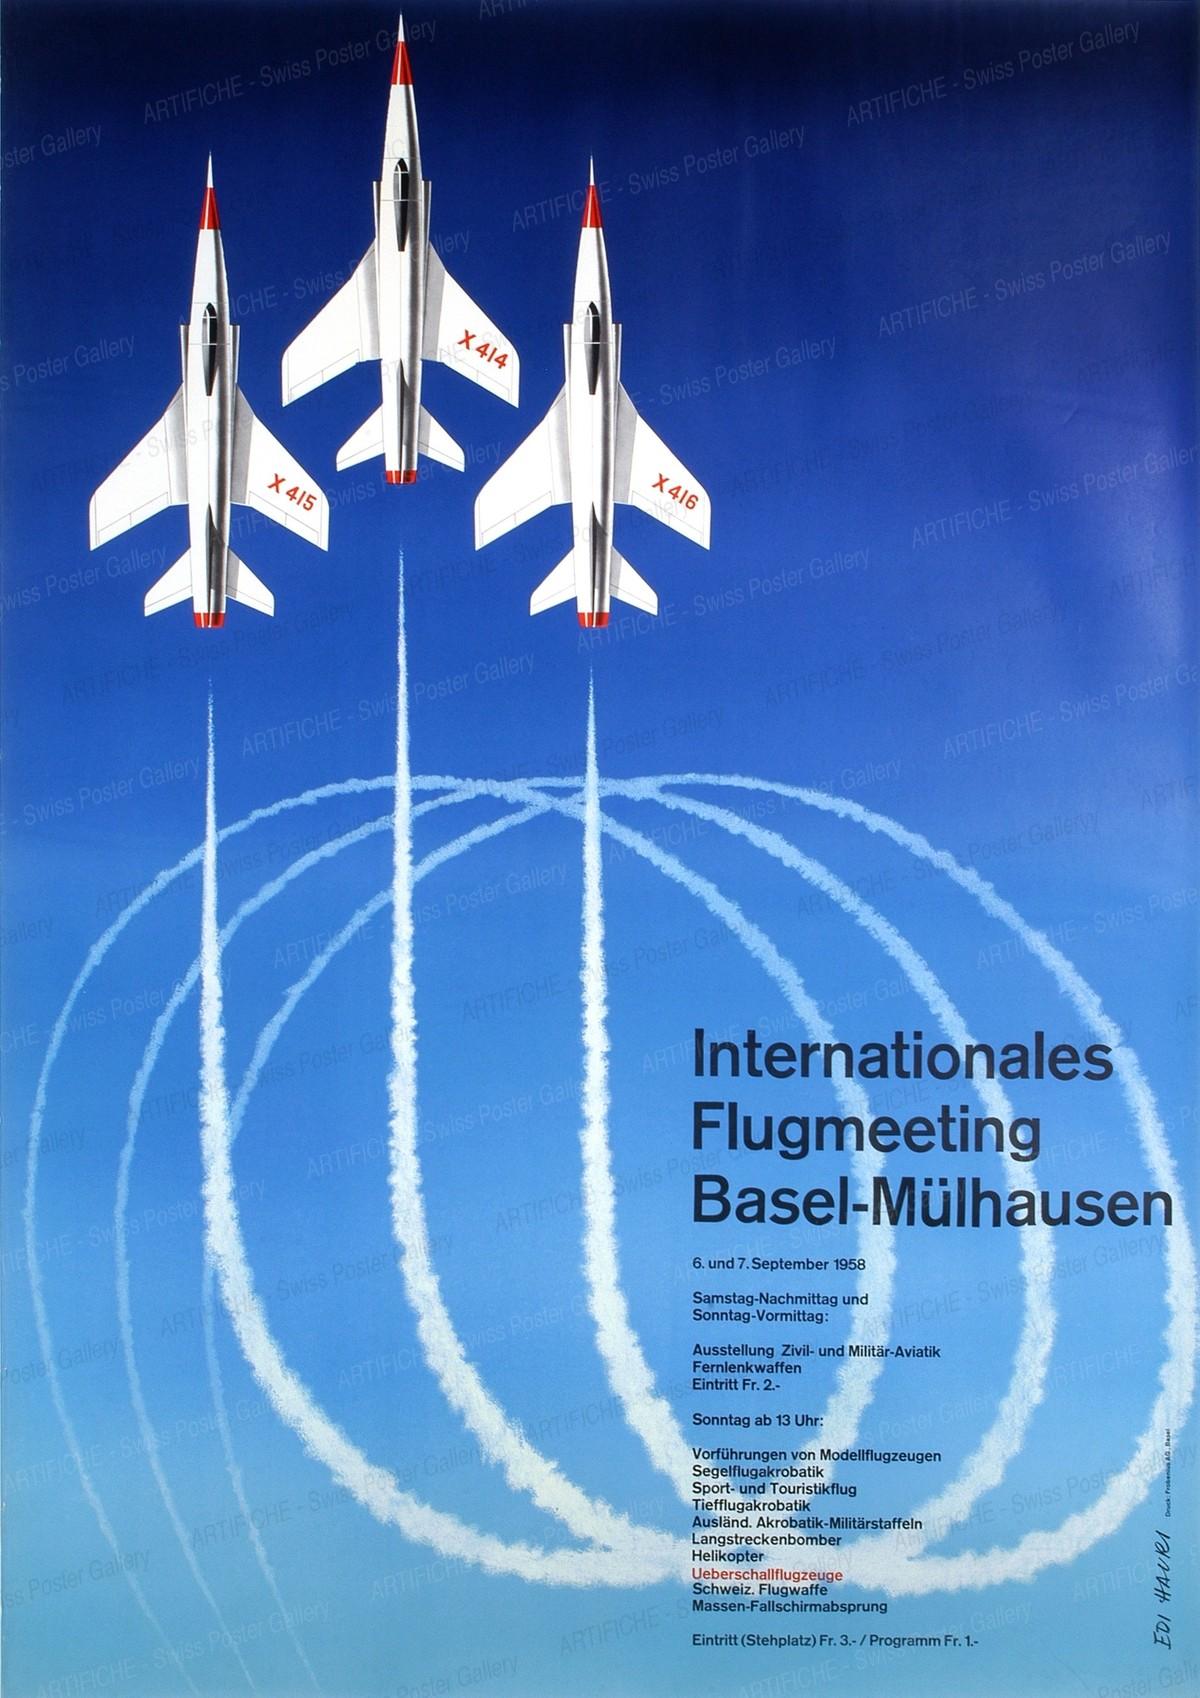 Internationales Flugmeeting Basel-Mülhausen 1958, Edi Hauri